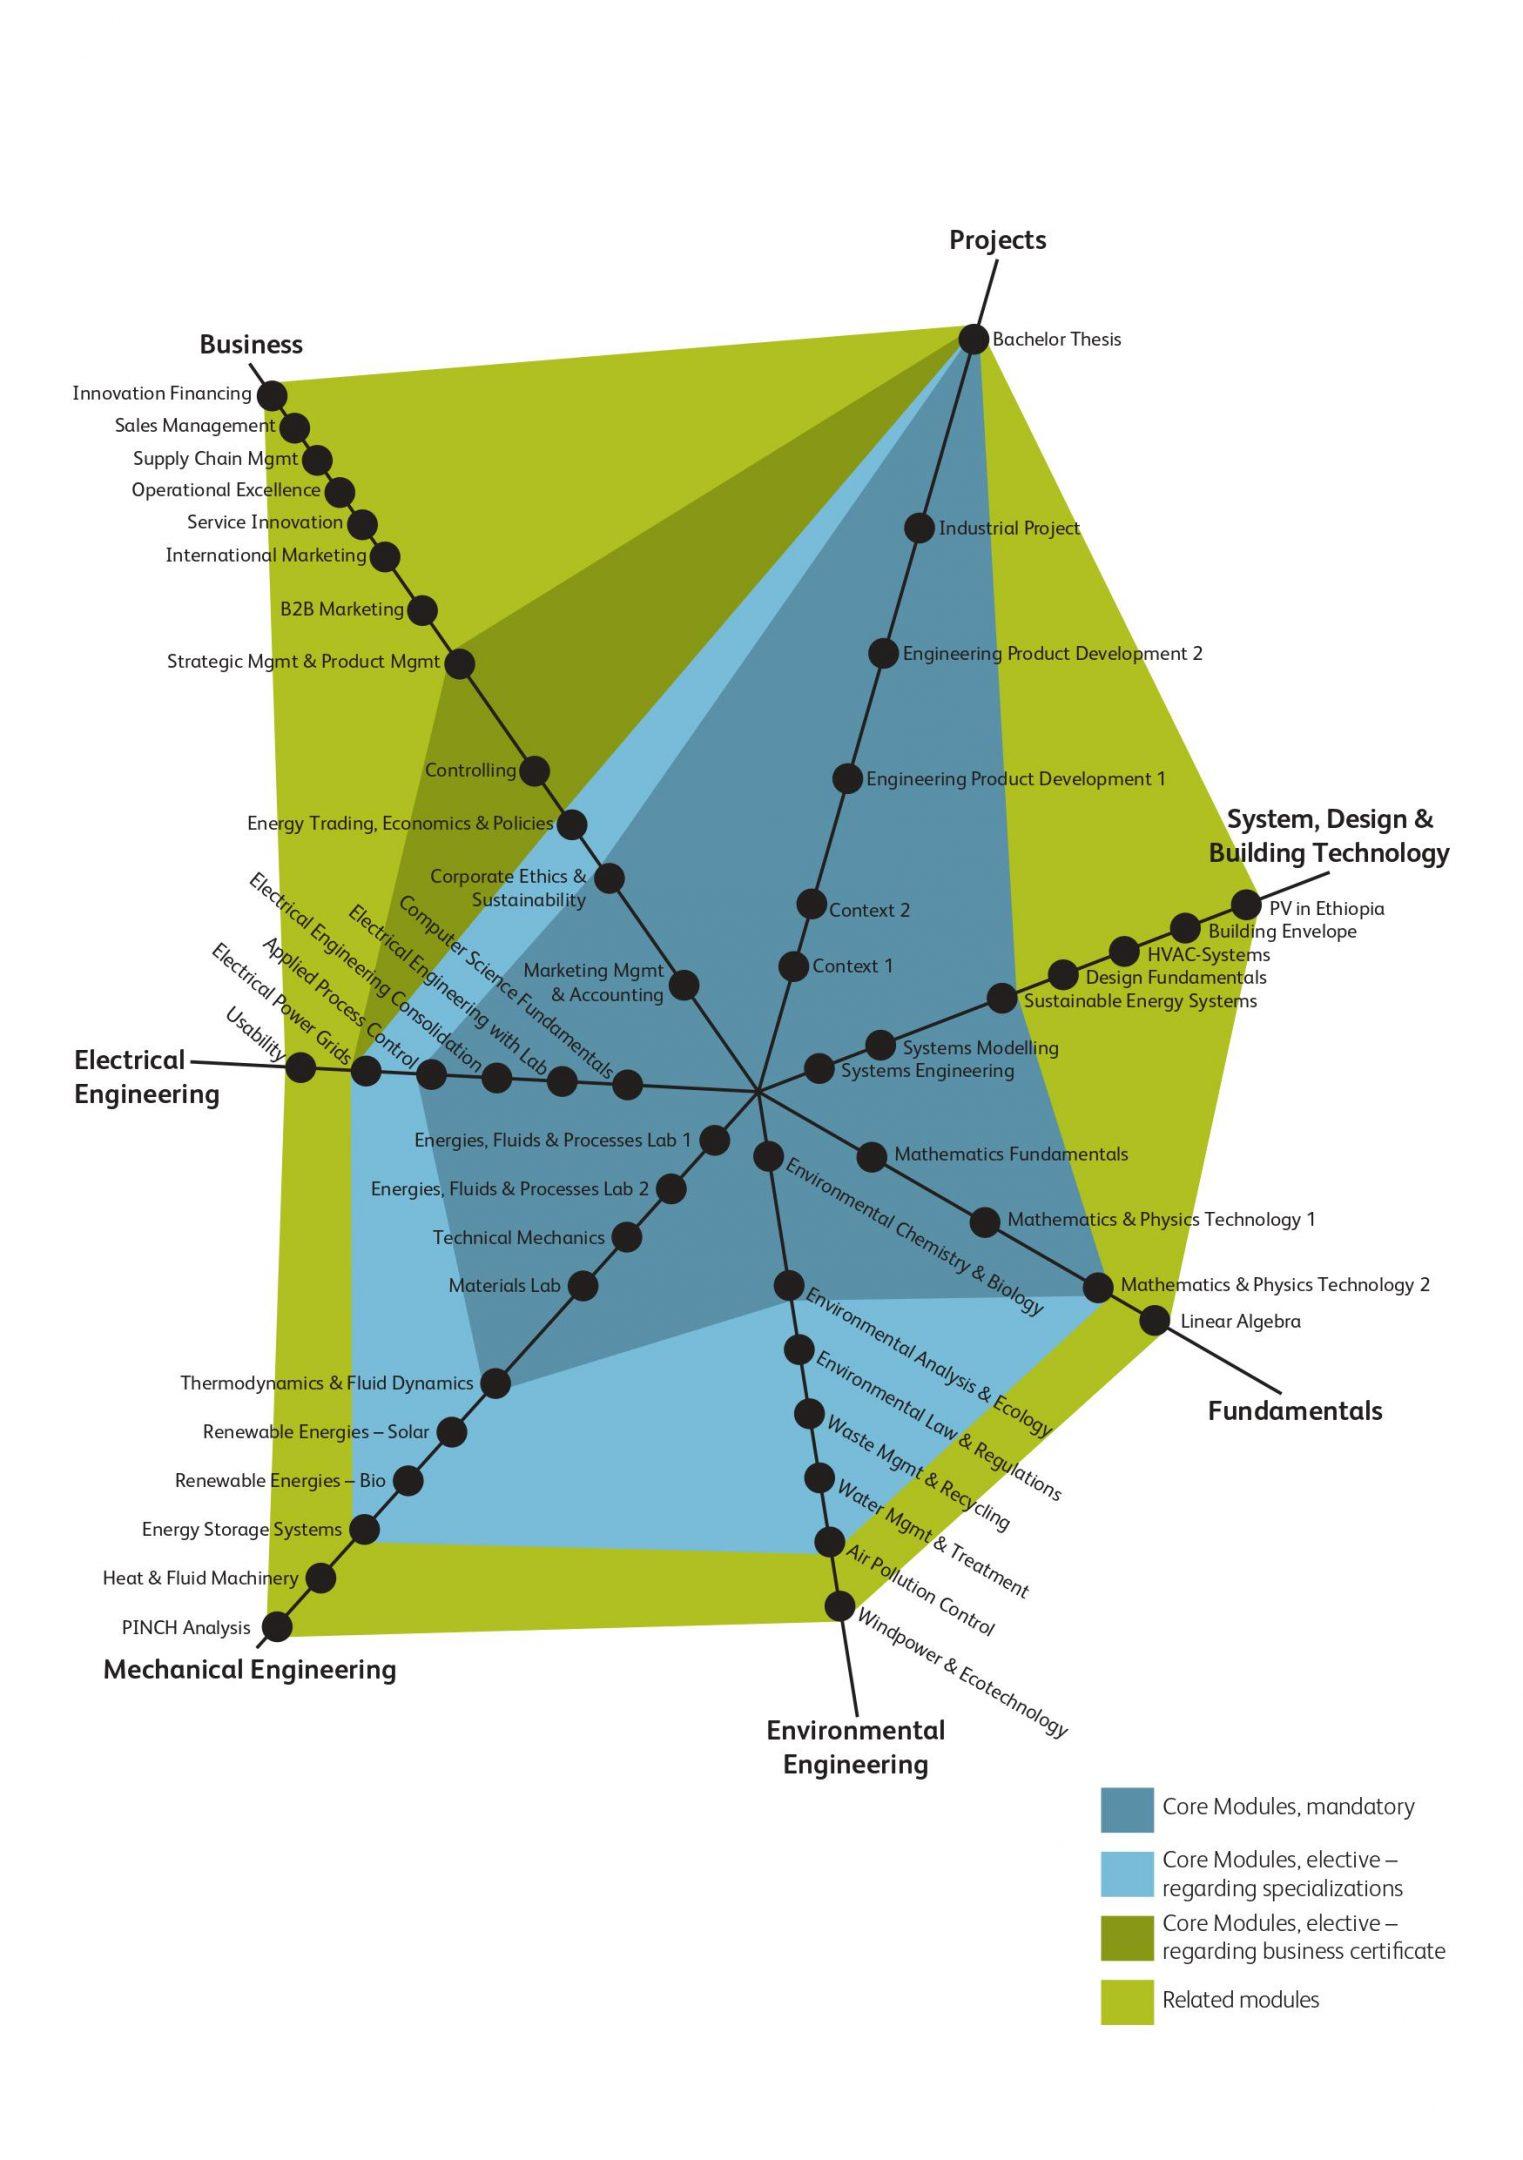 Explore modules and competencies